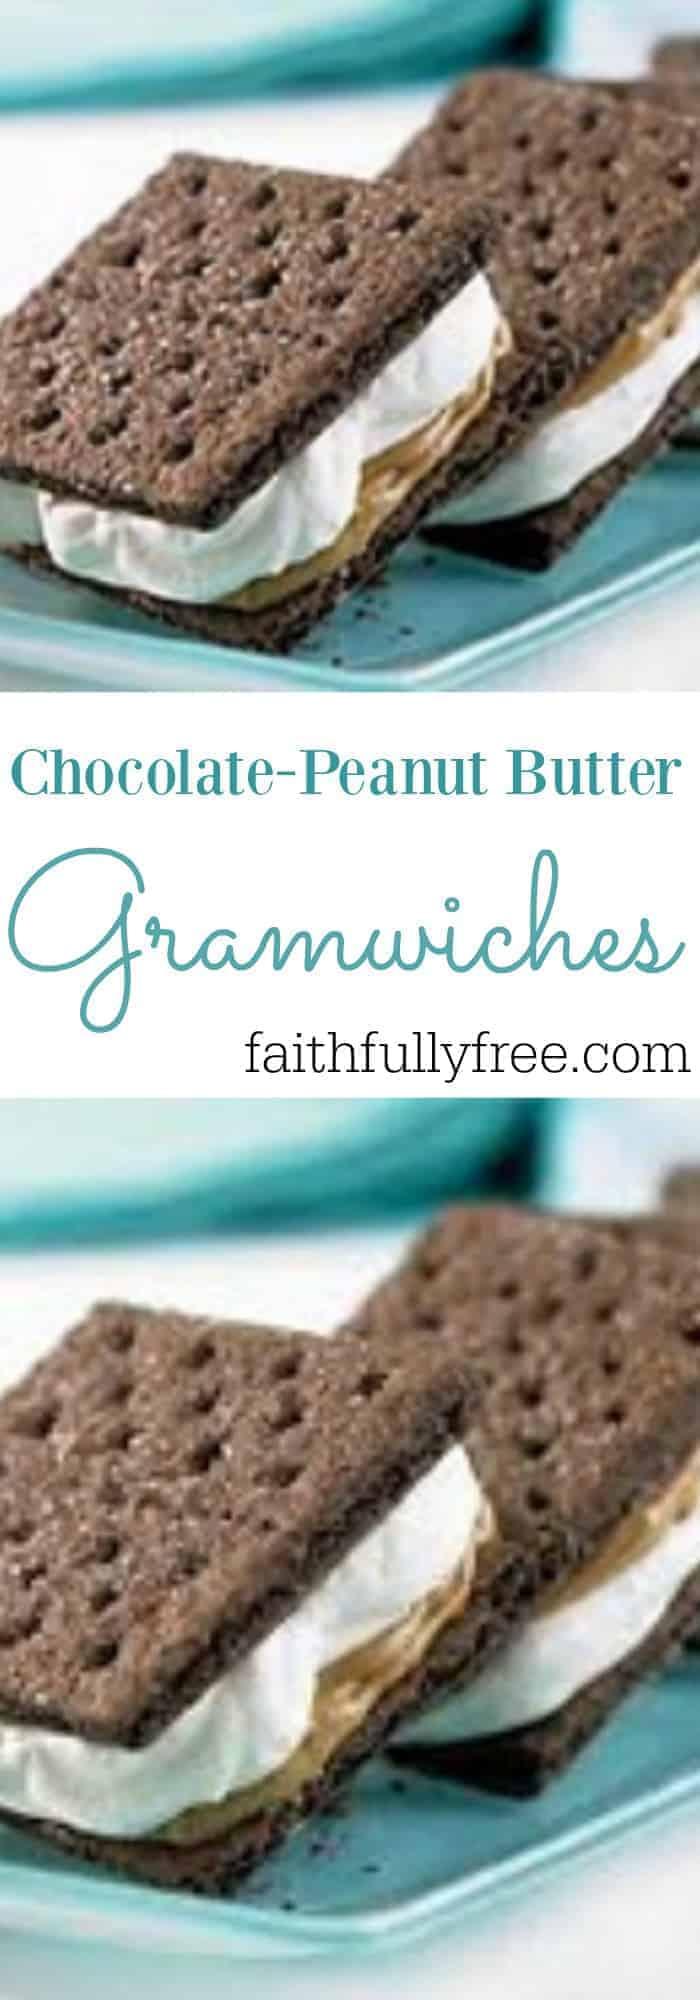 Biggest Loser Chocolate Peanut Butter Gramwiches